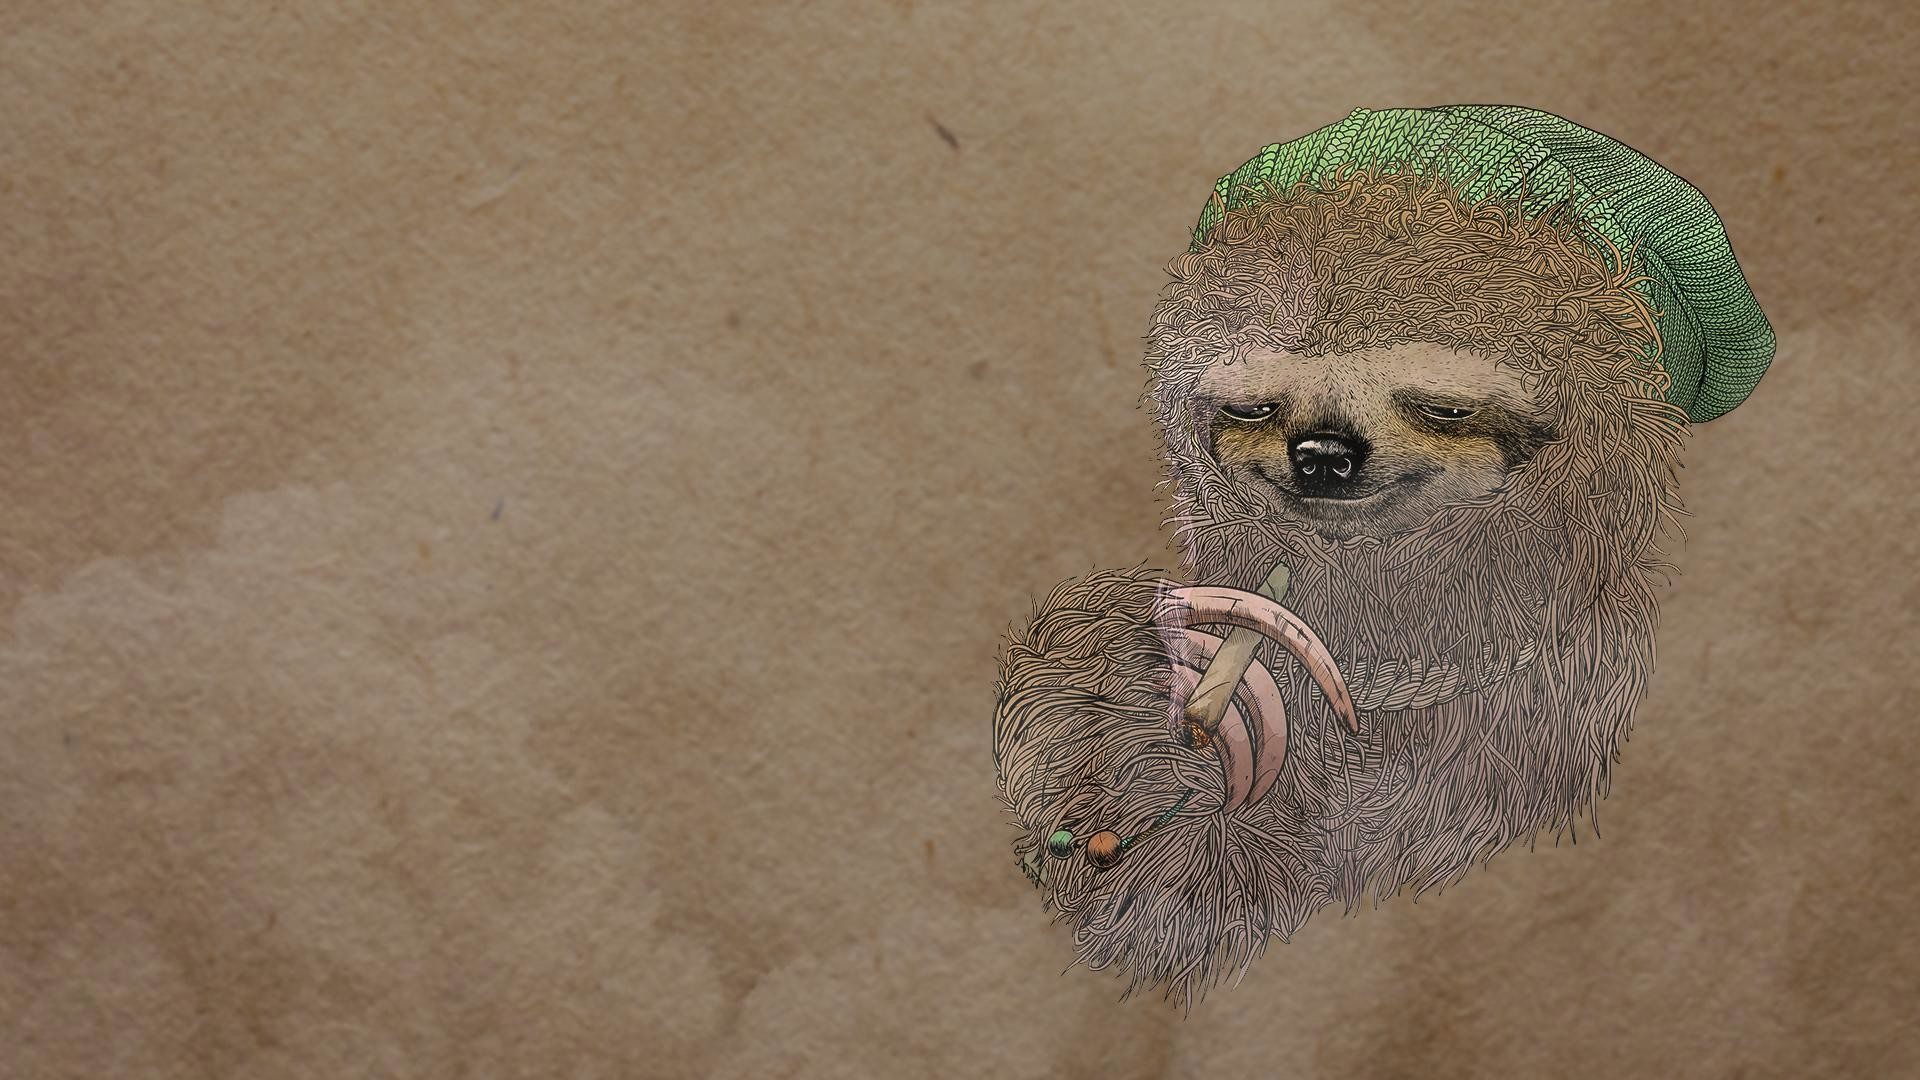 Sloth-Image-Download-Free